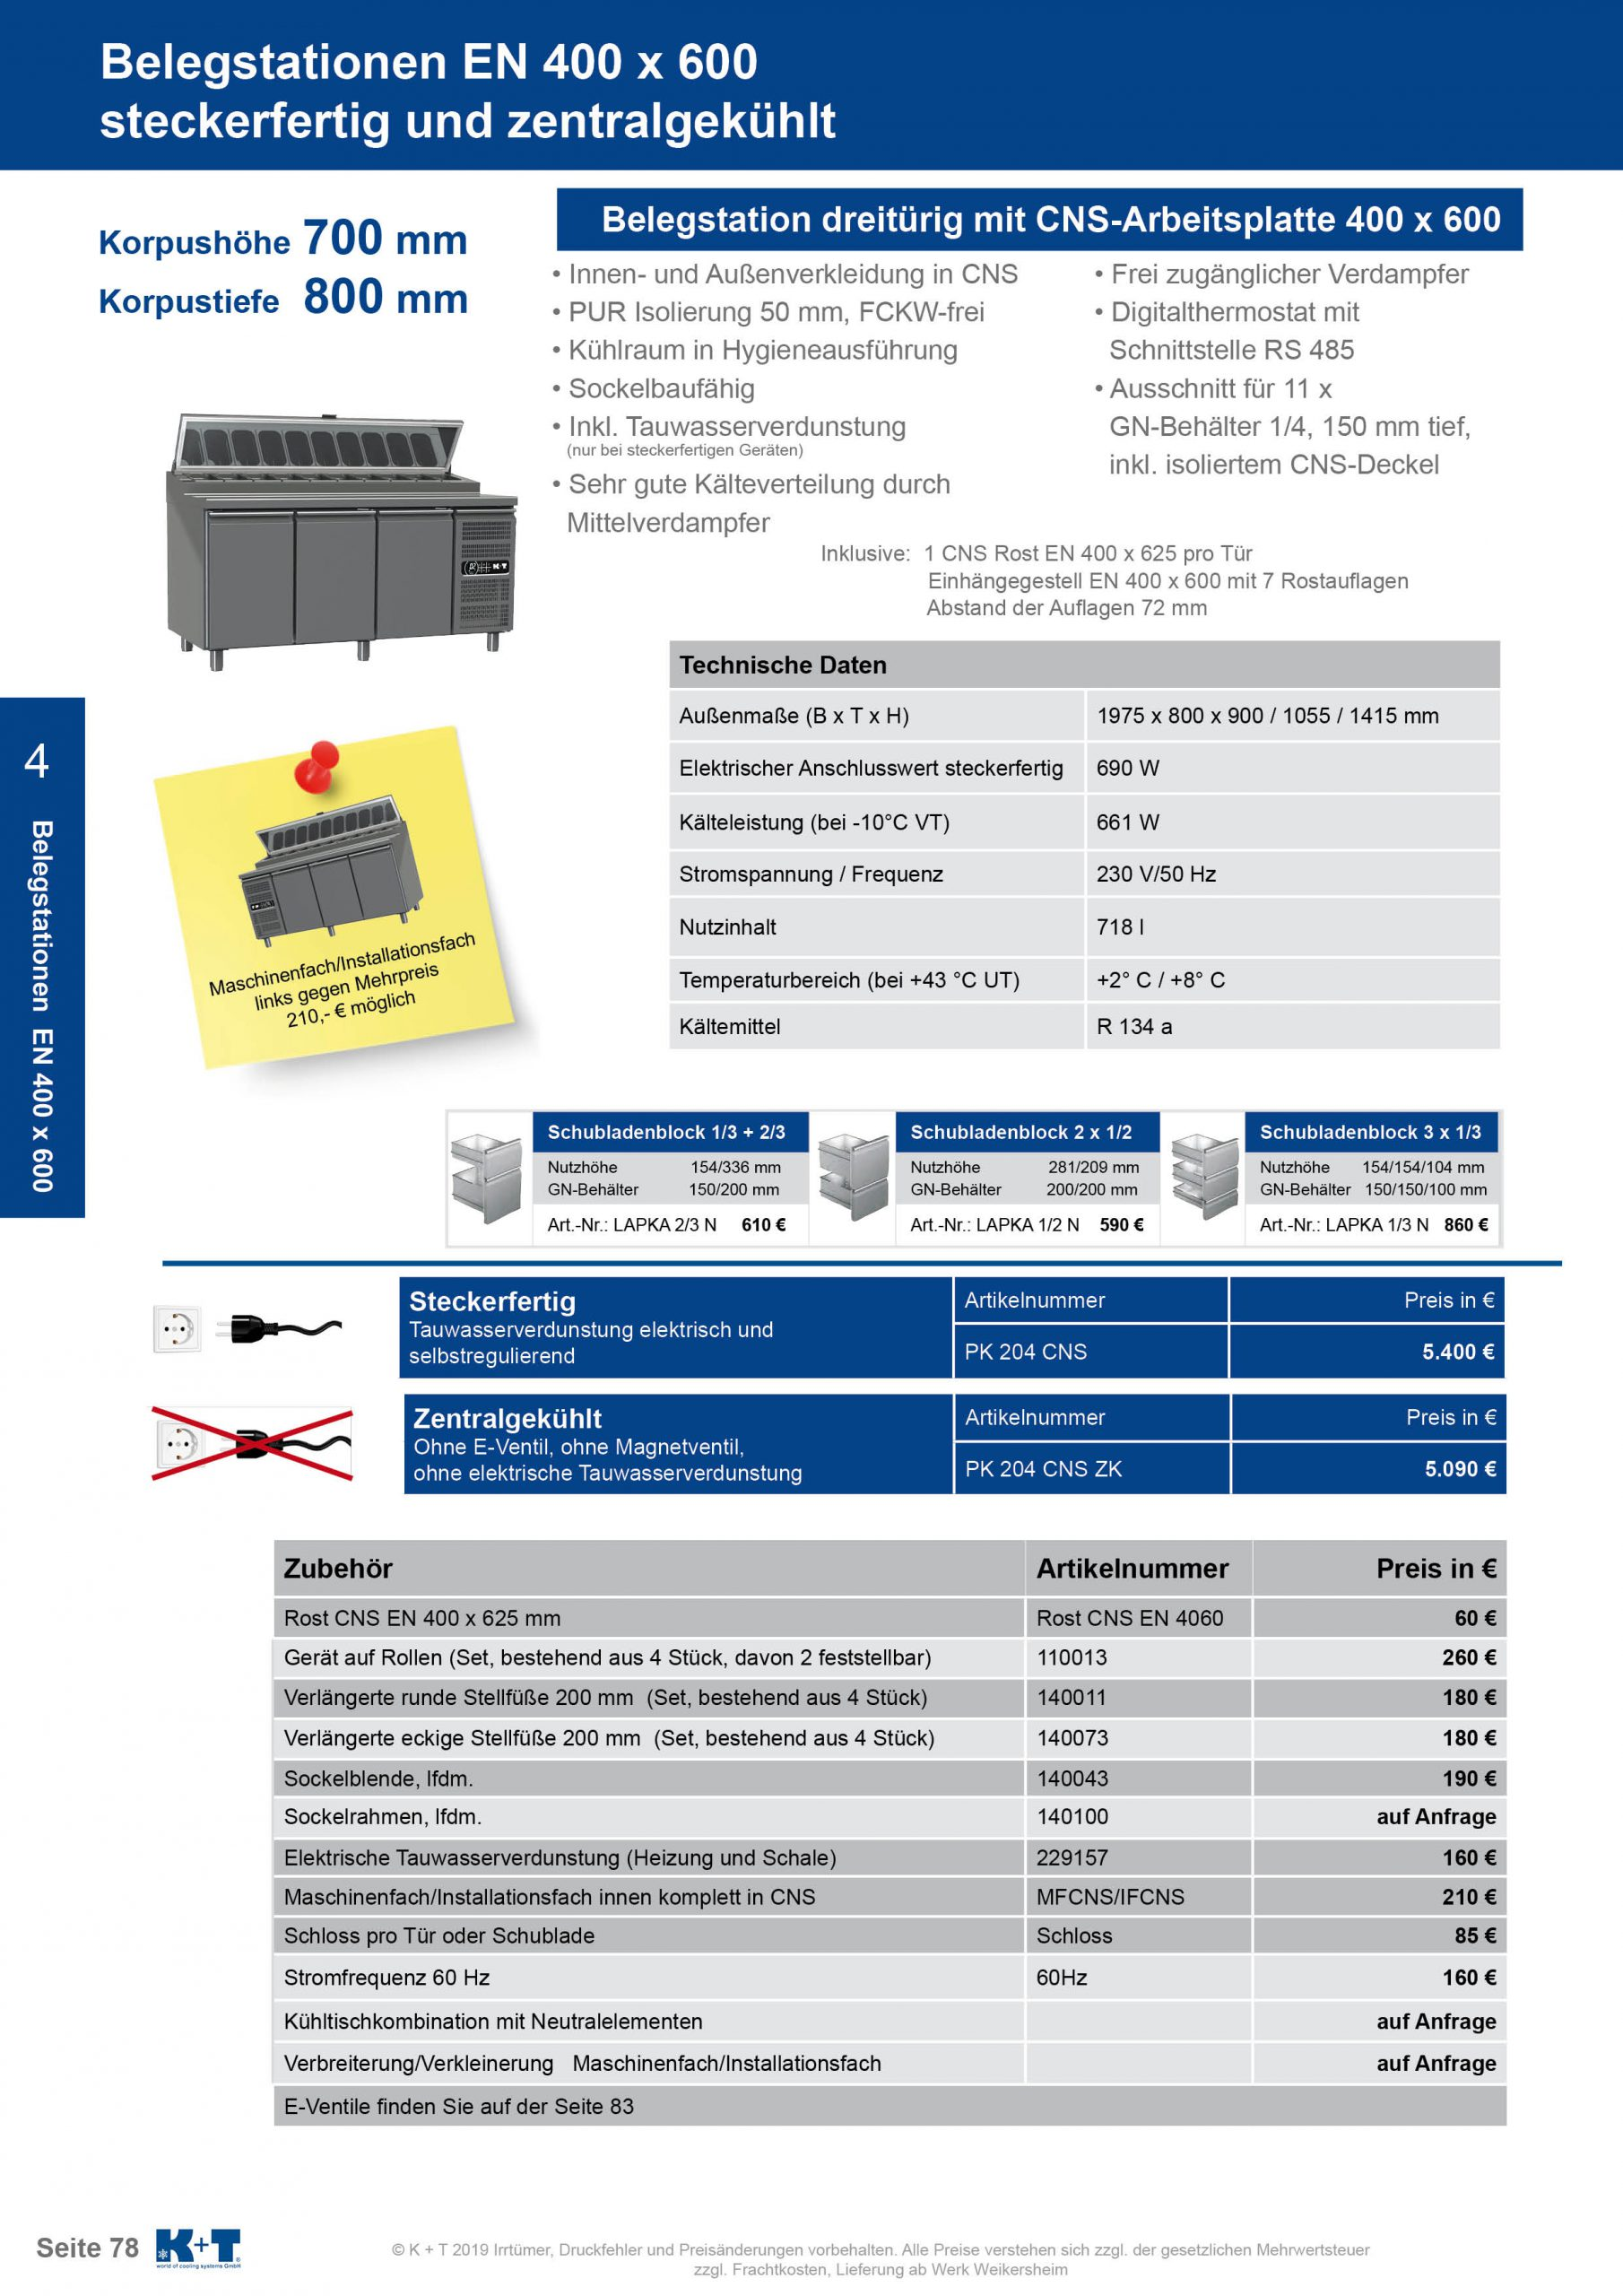 Belegstation Euronorm 400 x 600 Korpushöhe 700, Tiefe 800 steckerfertig 3